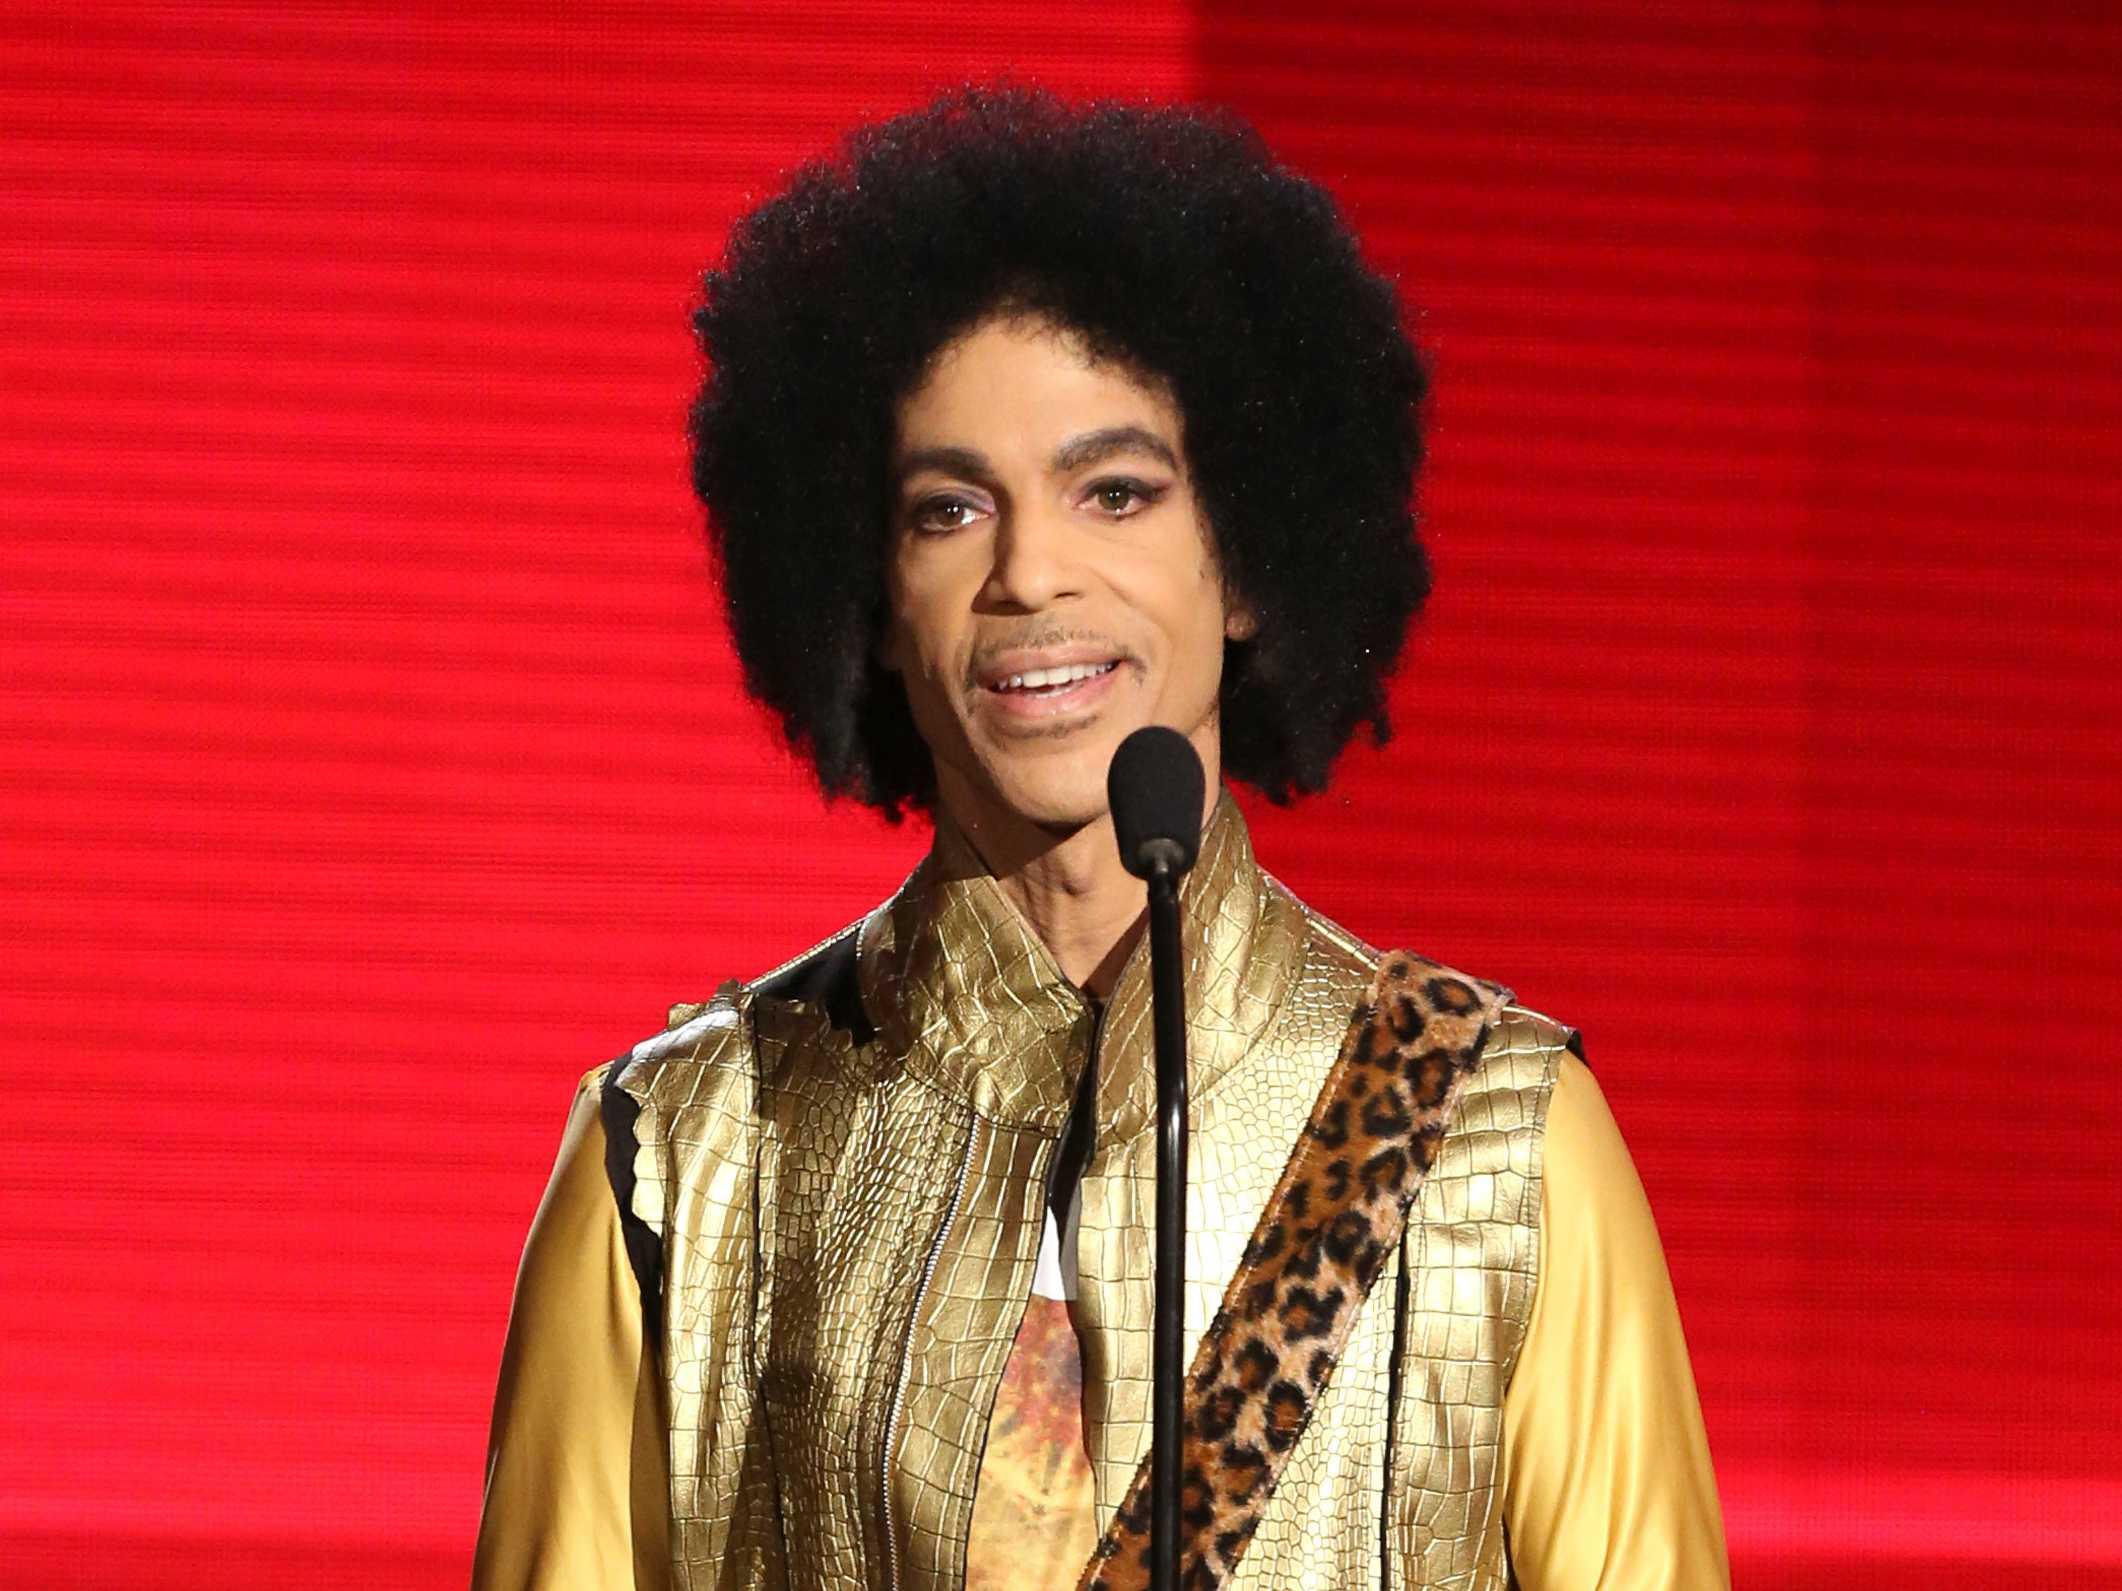 As Prince's Health Waned, Alarm Grew in Inner Circle